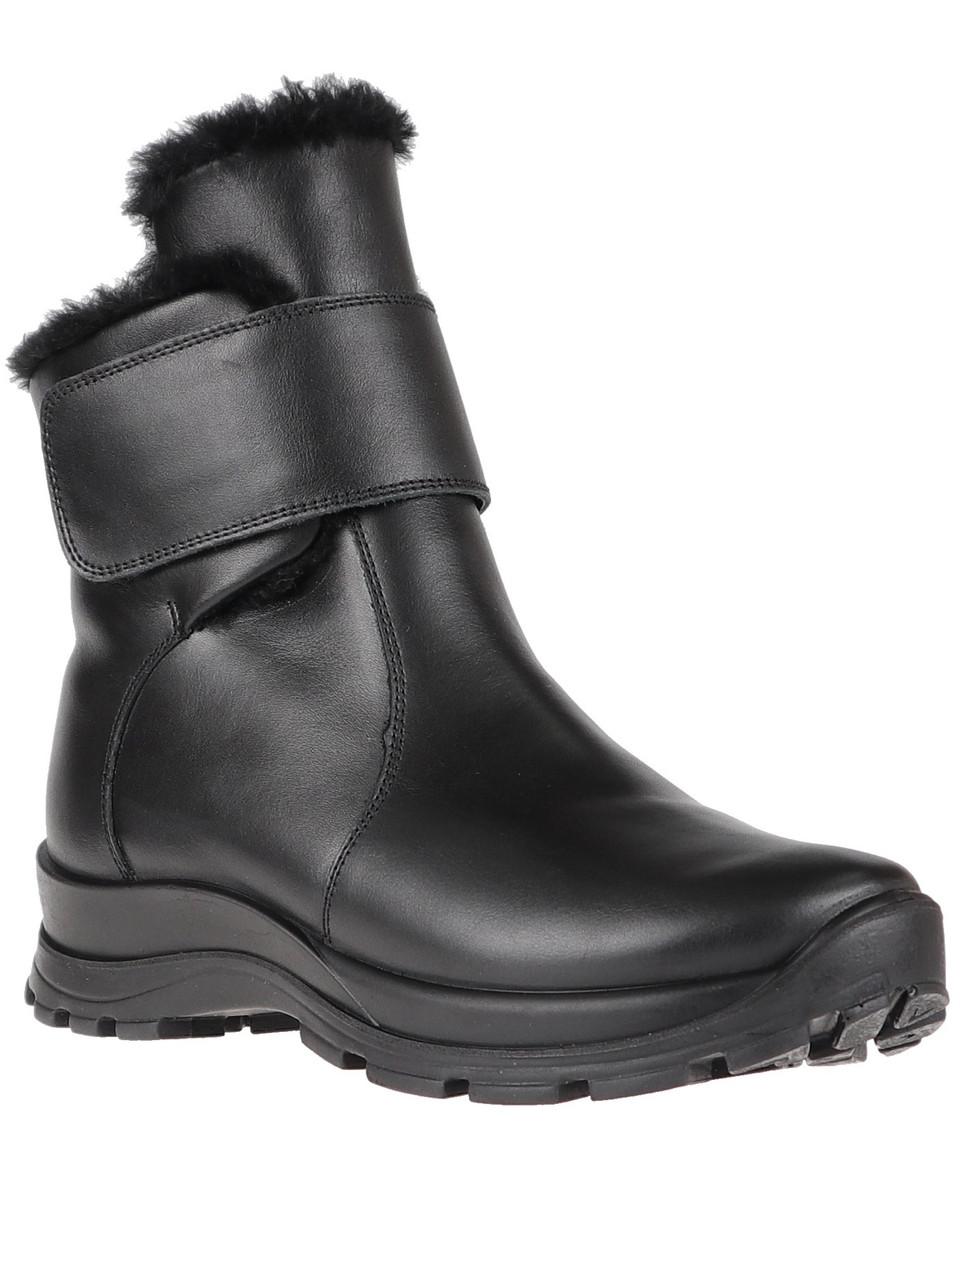 Ботинки женские зимние Romika 87084R100